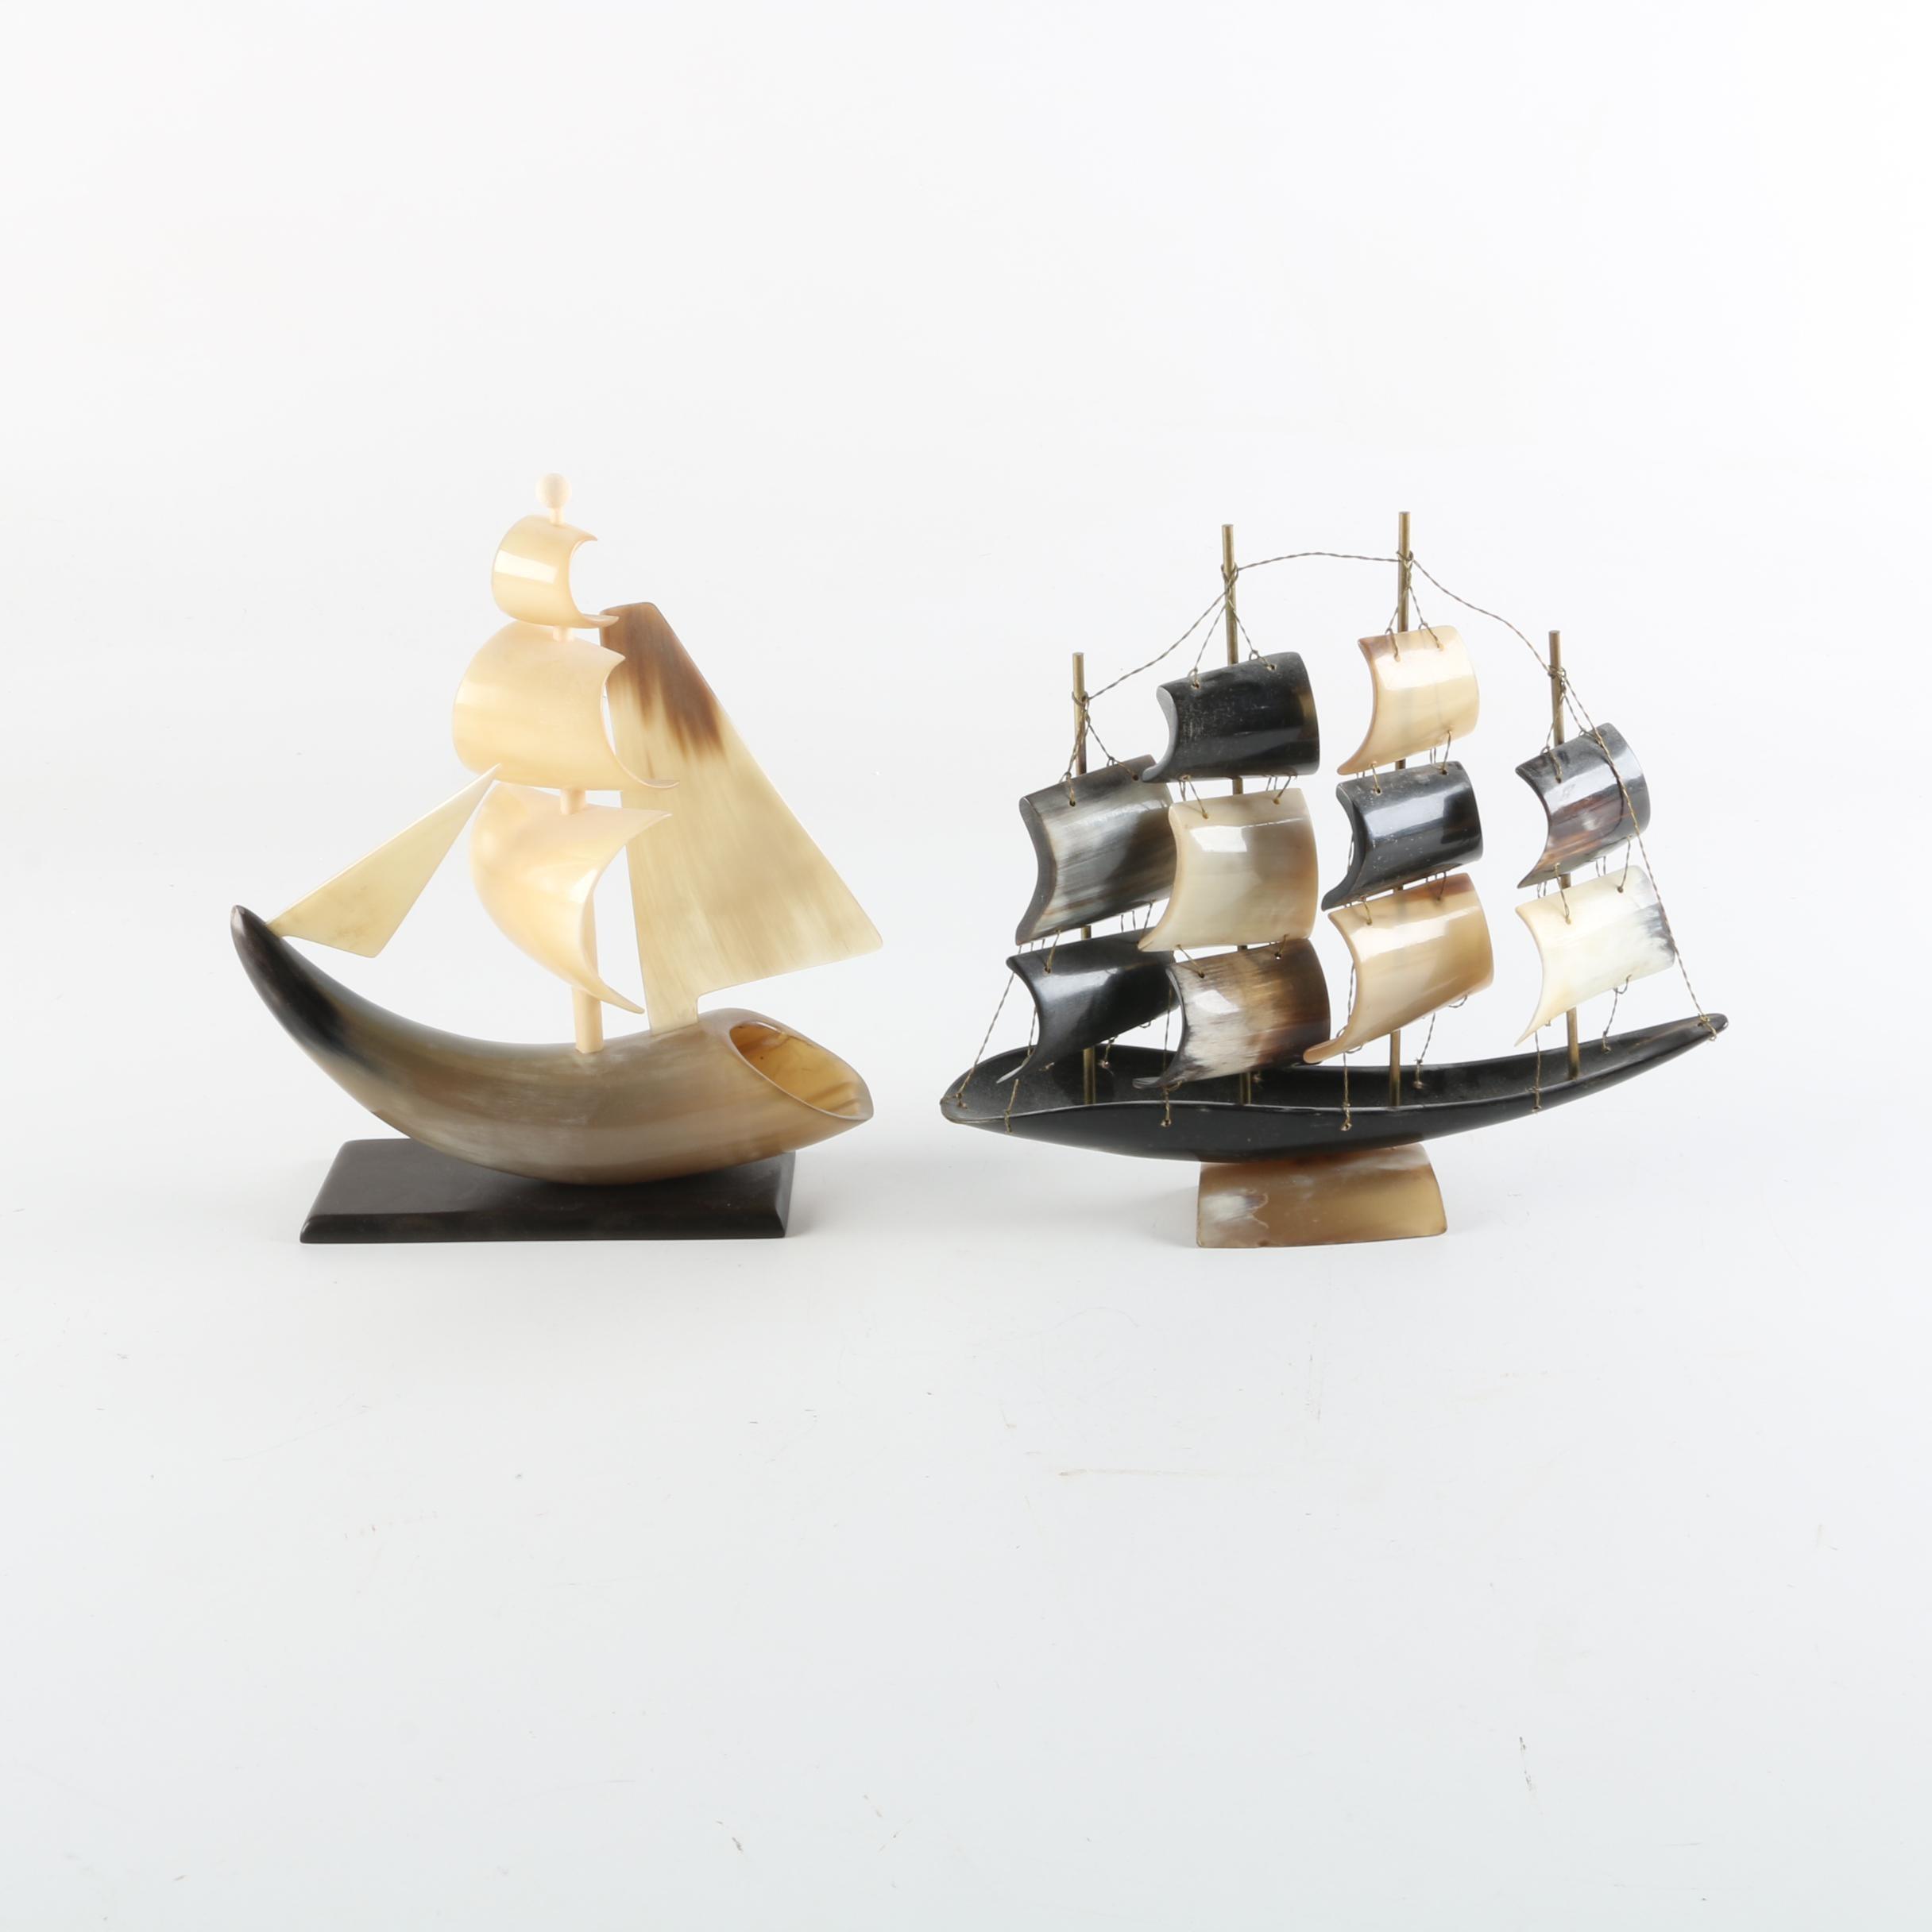 Carved Horn Sculptures of Boats